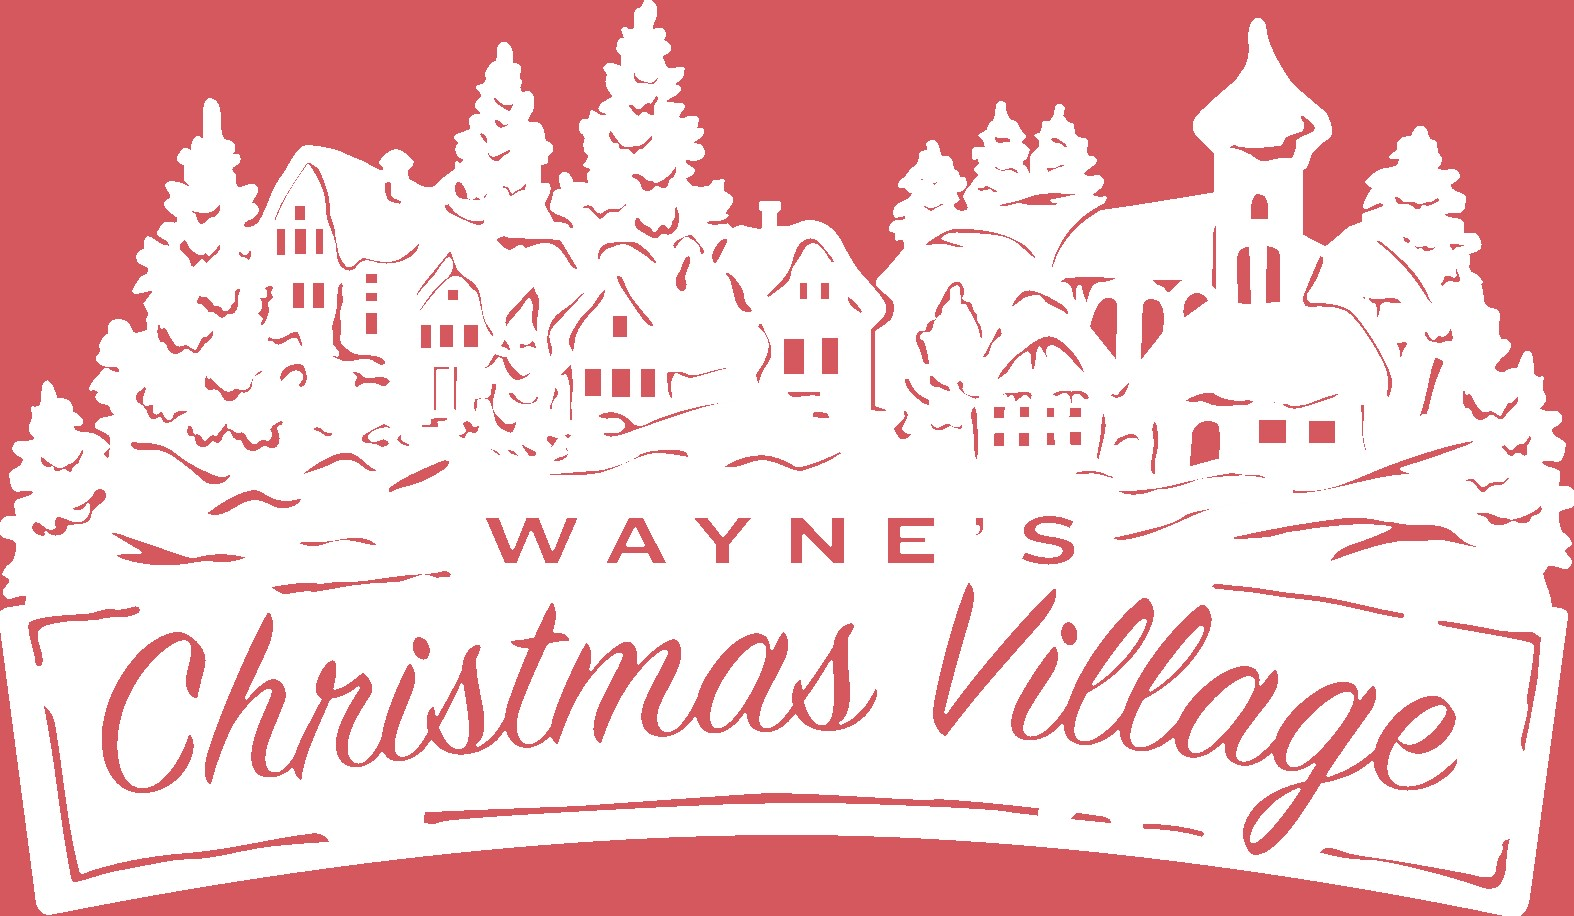 Wayne's Christmas Village